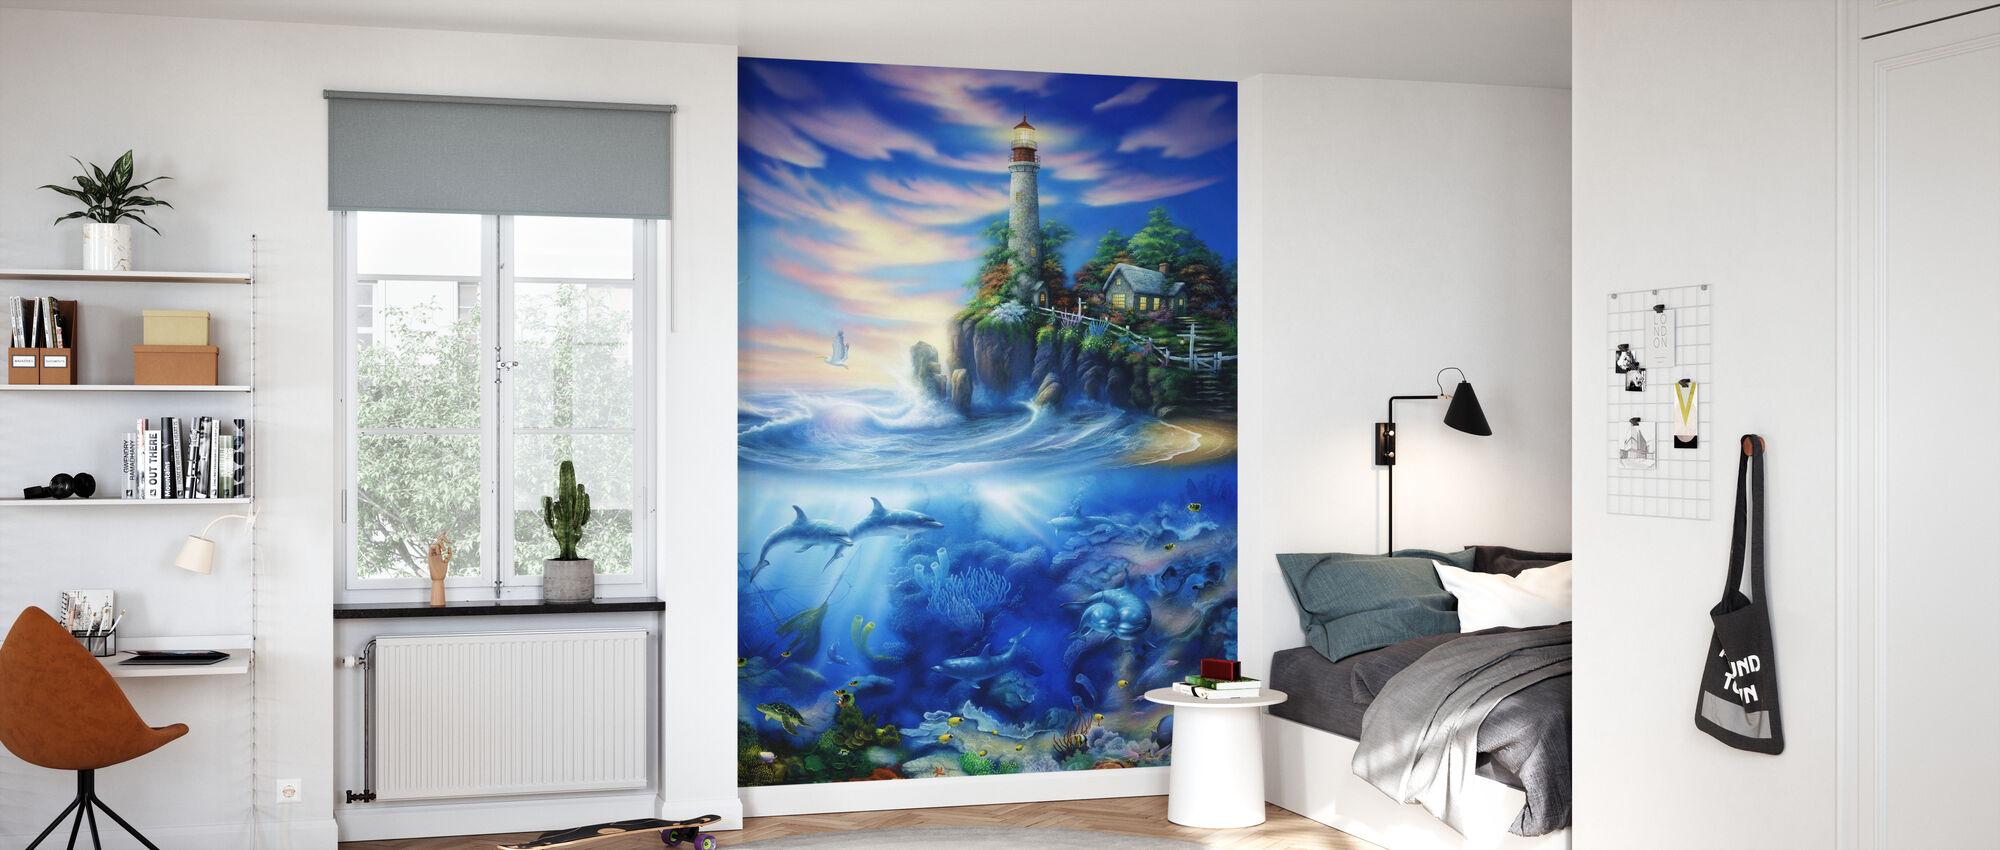 Eternal Light - Wallpaper - Kids Room